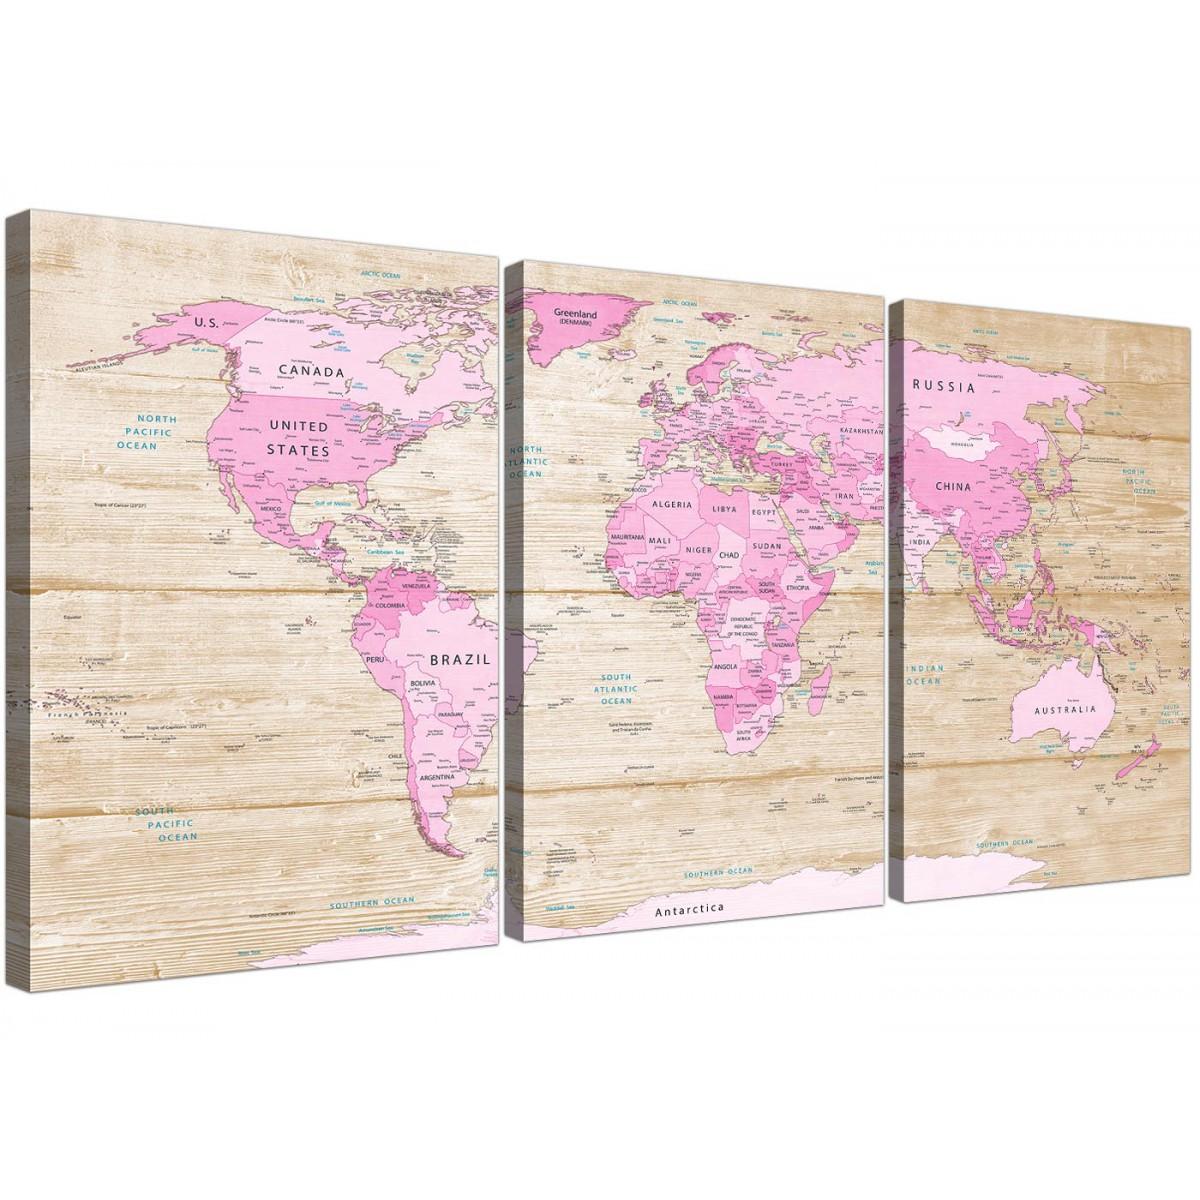 Large pink cream map of world atlas canvas wall art print multi 3 large pink cream map of world atlas canvas wall art multi 3 piece 3309 gumiabroncs Gallery